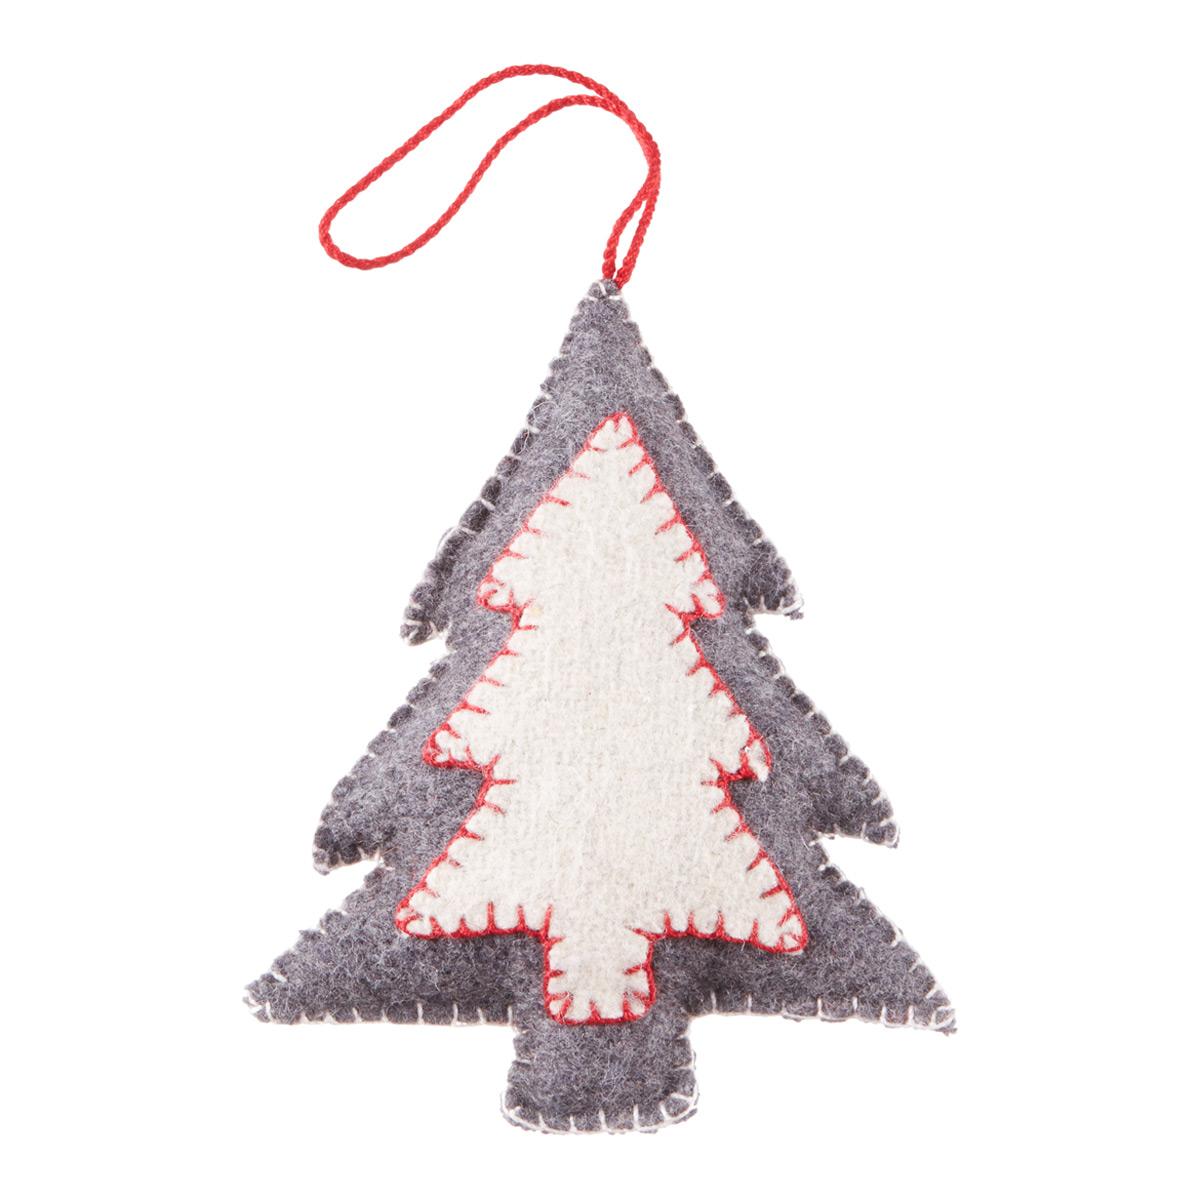 Tie-On Stitched Tree